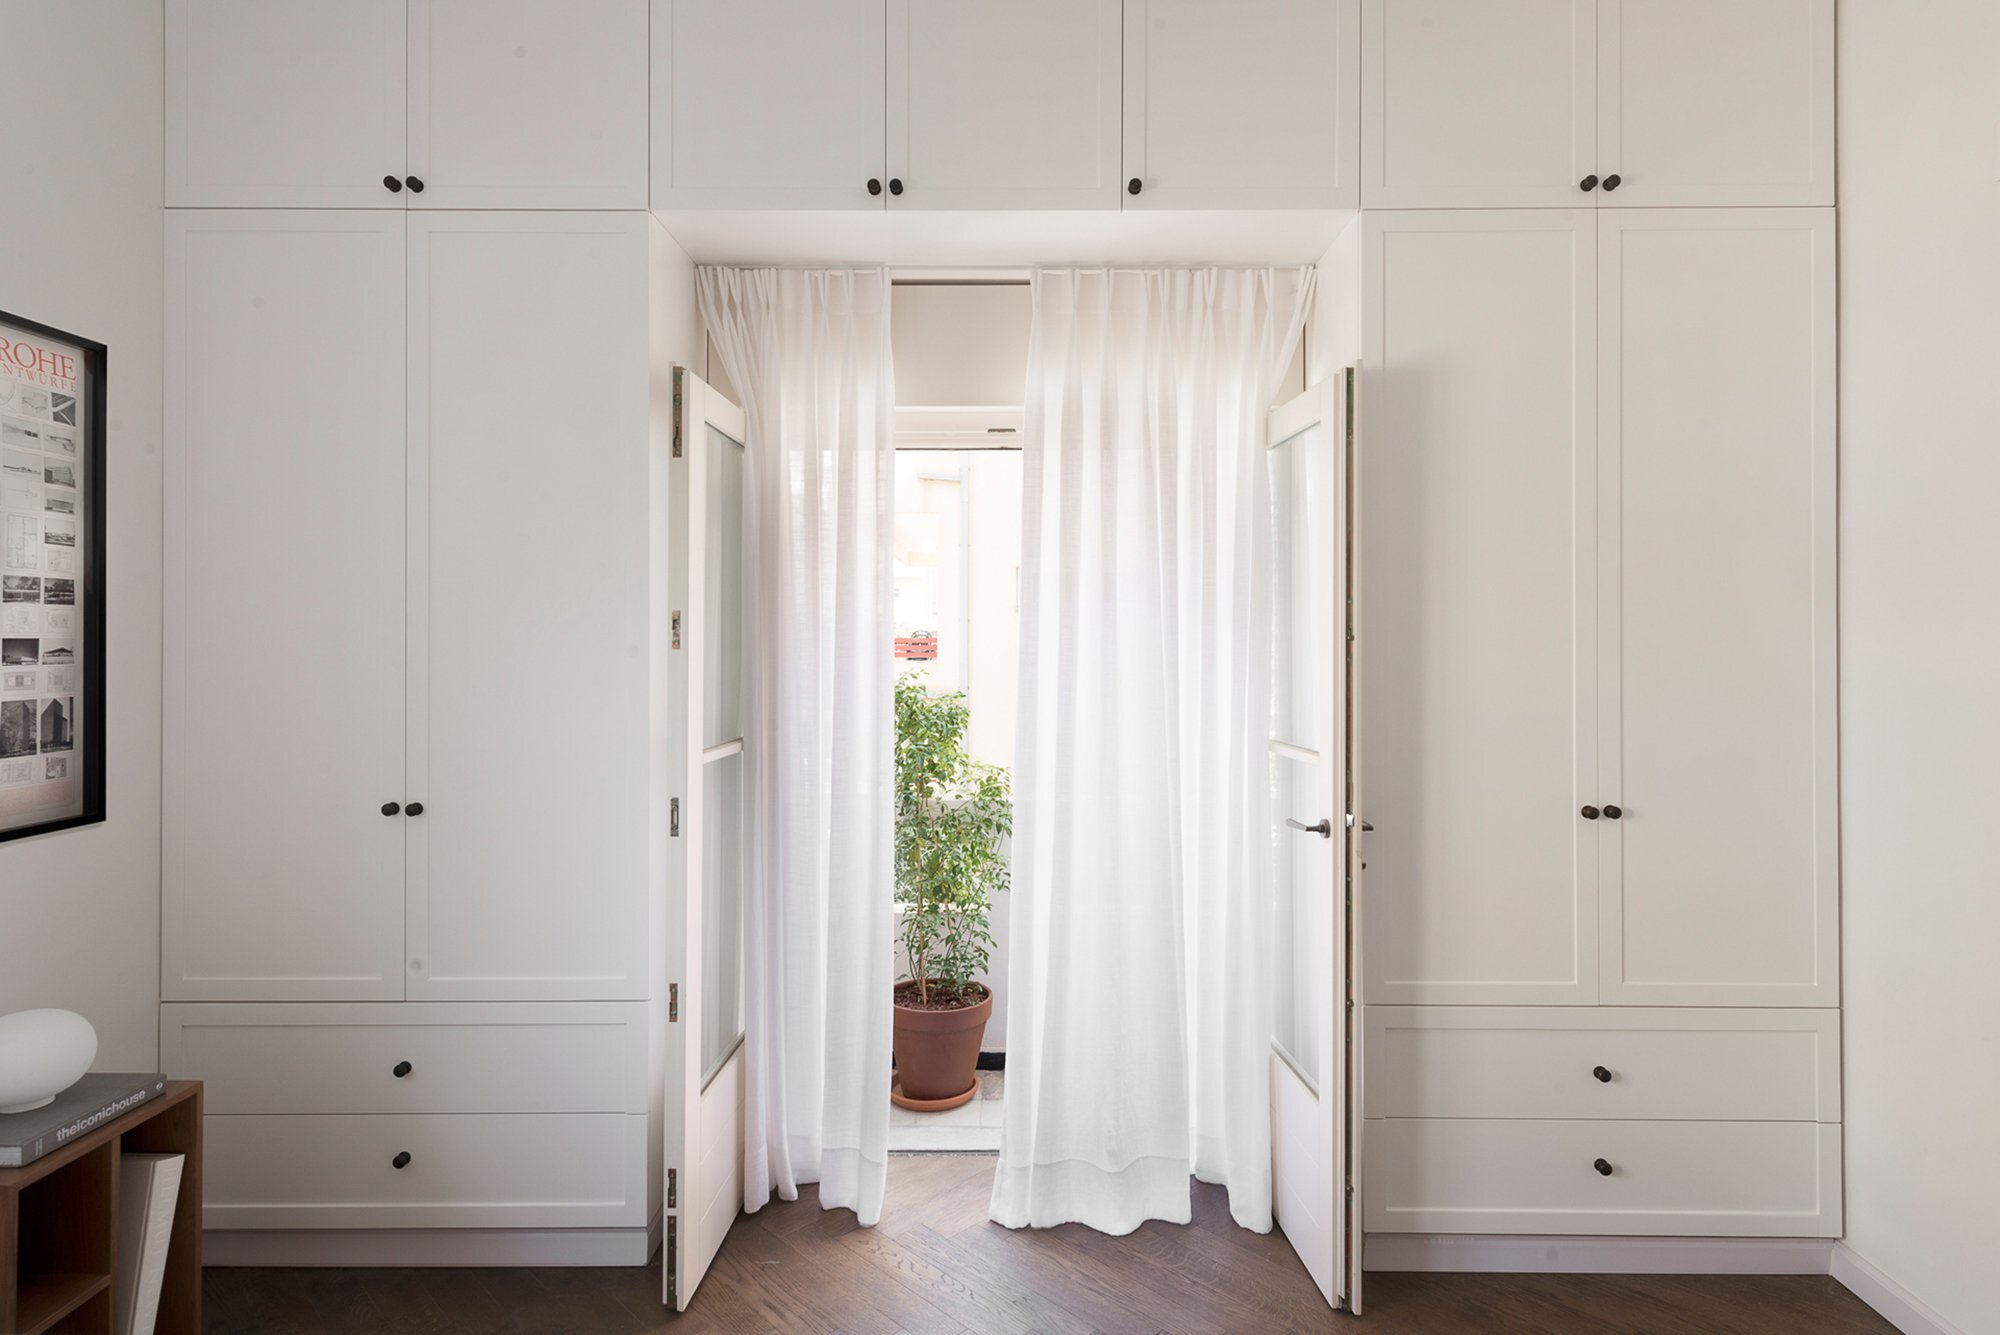 Bauhaus Apartment Redesign - Small Apartment - Studio Raanan Stern Architect - Tel Aviv - Storage - Humble Homes